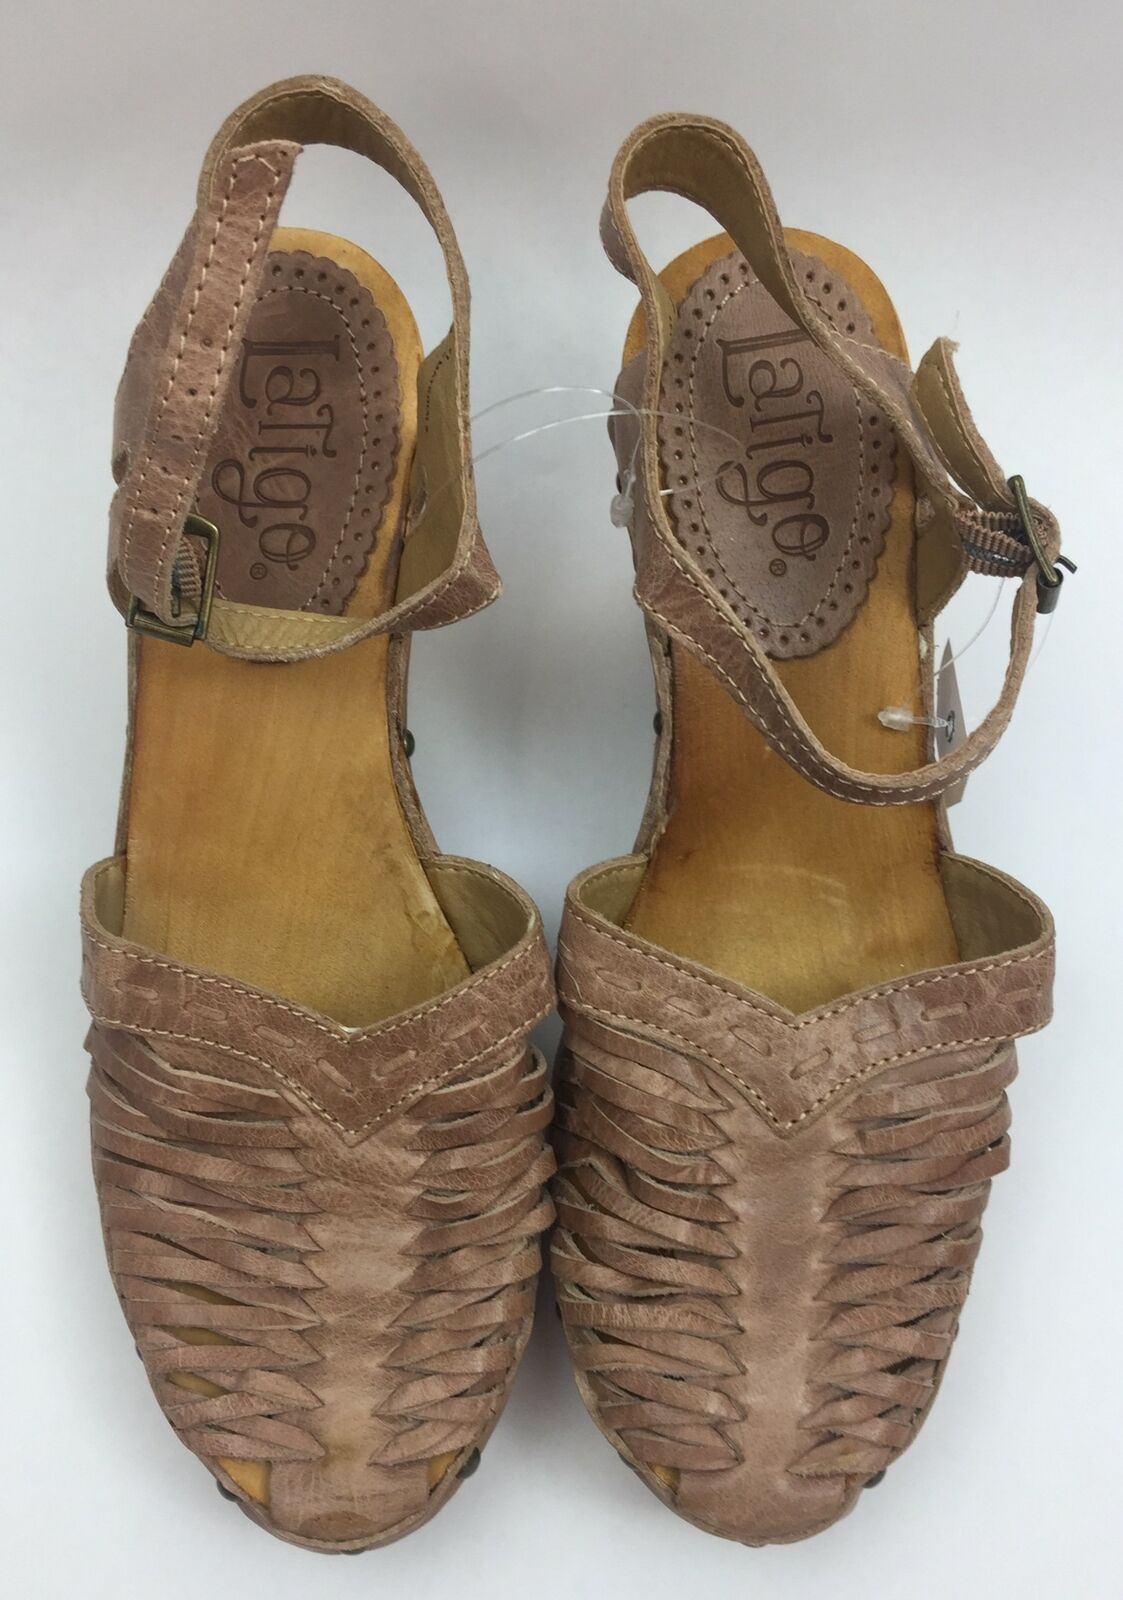 Latigo Women's Brown Size 10 M Leather Upper Closed Toe Heels NWOB